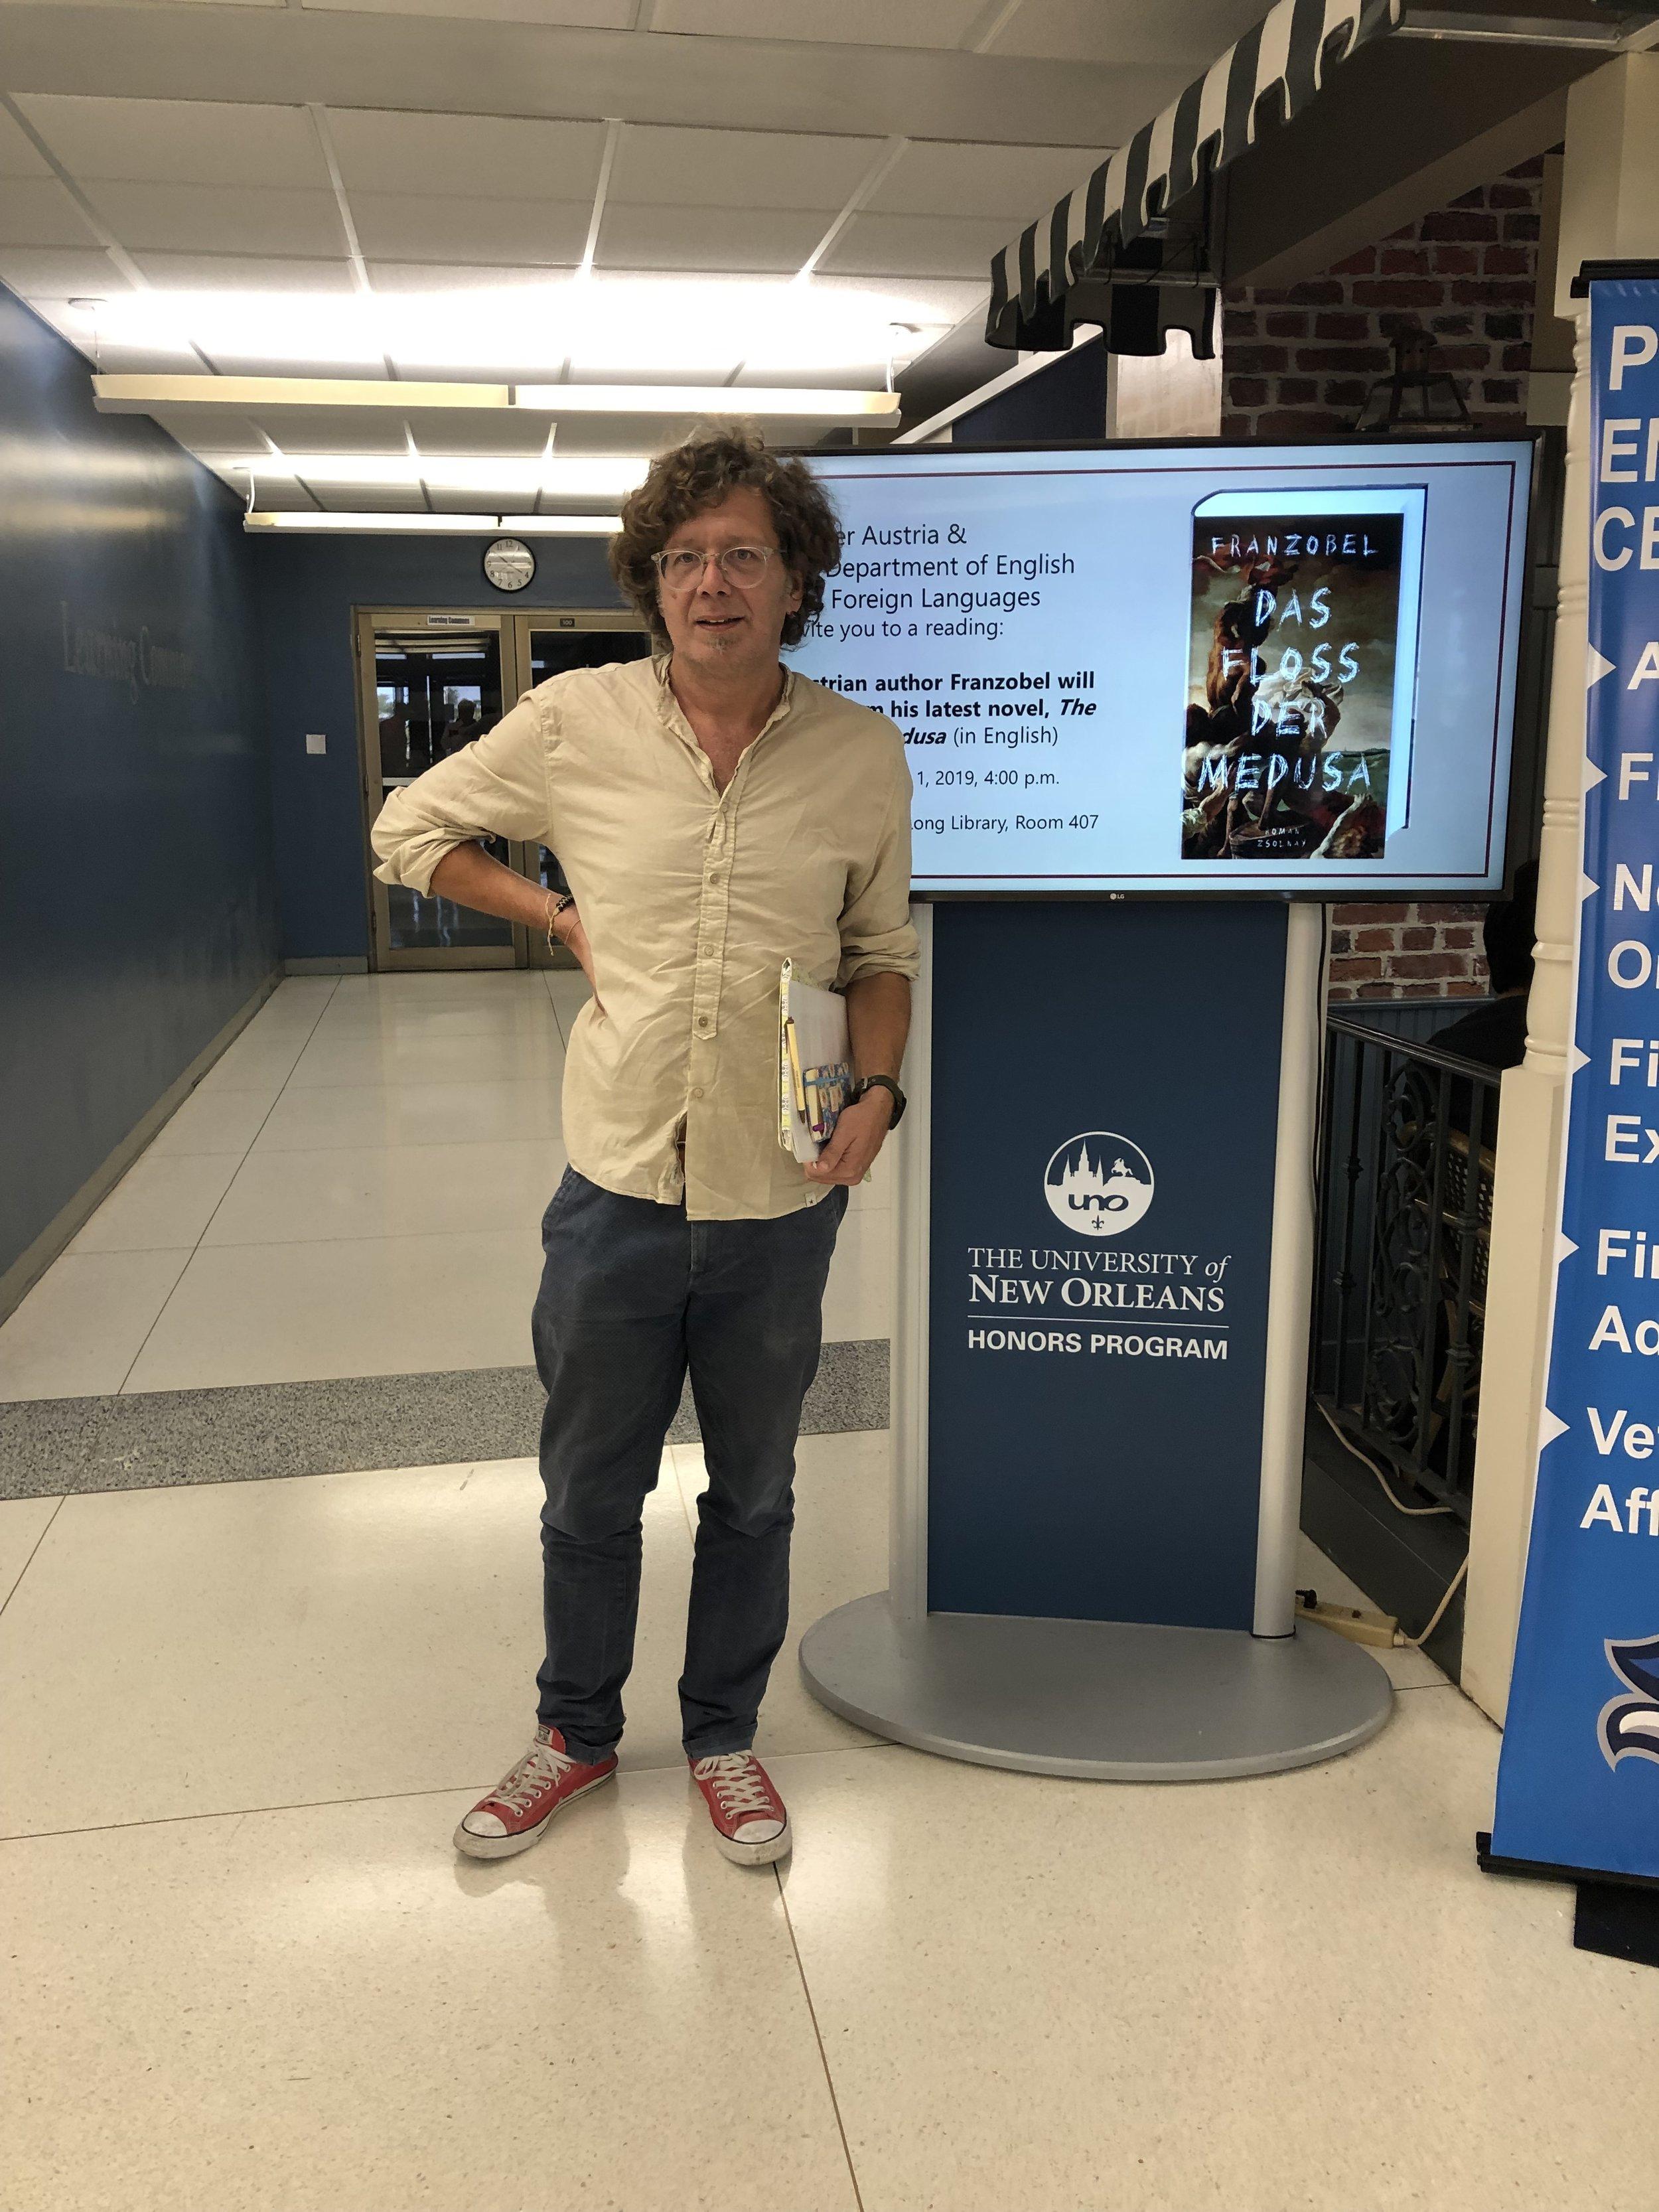 Franzobel at The University of New Orleans.